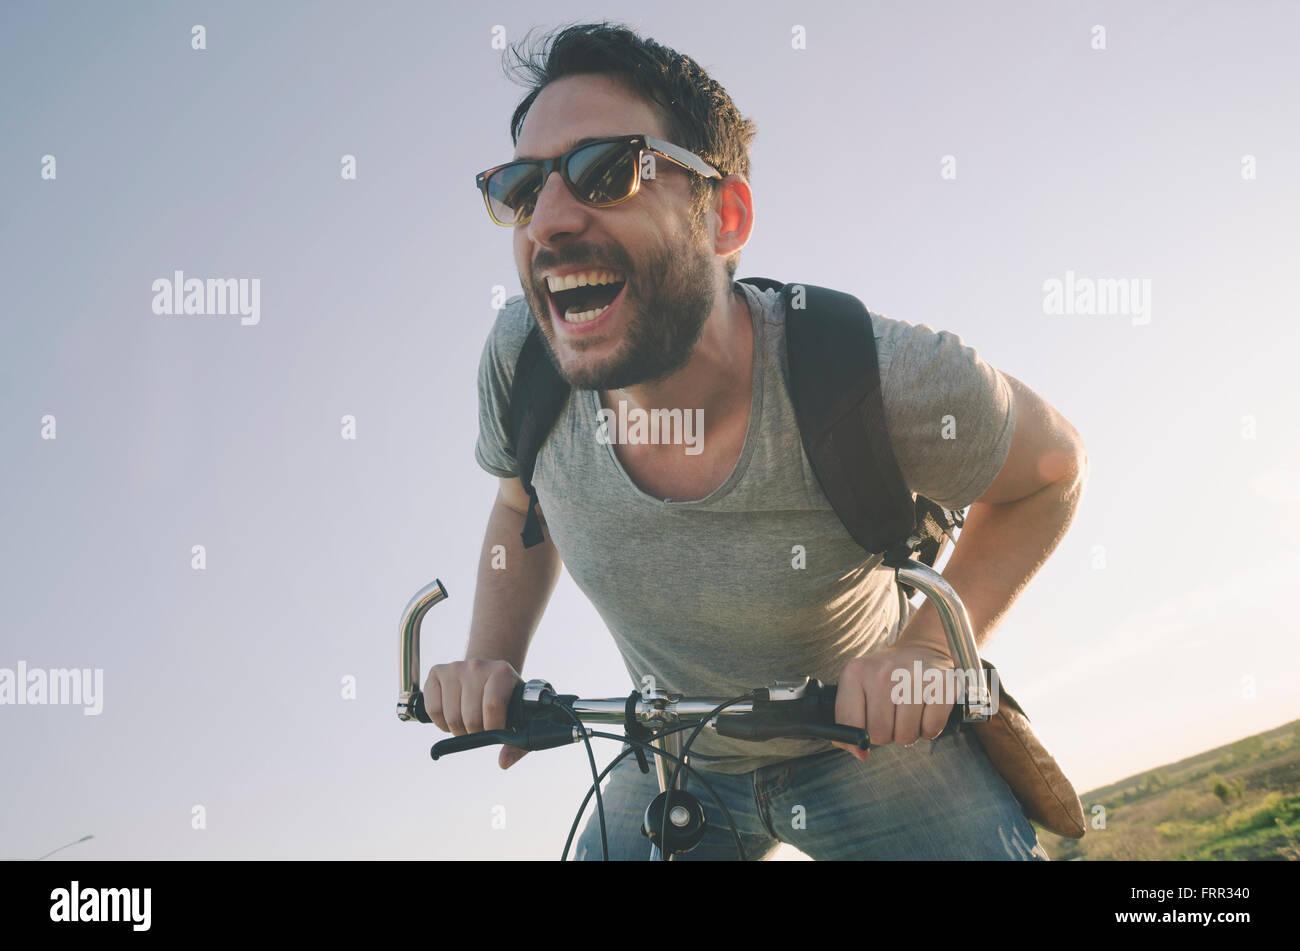 Mann mit dem Fahrrad Spaß. Retro-Stil Bild. Stockfoto